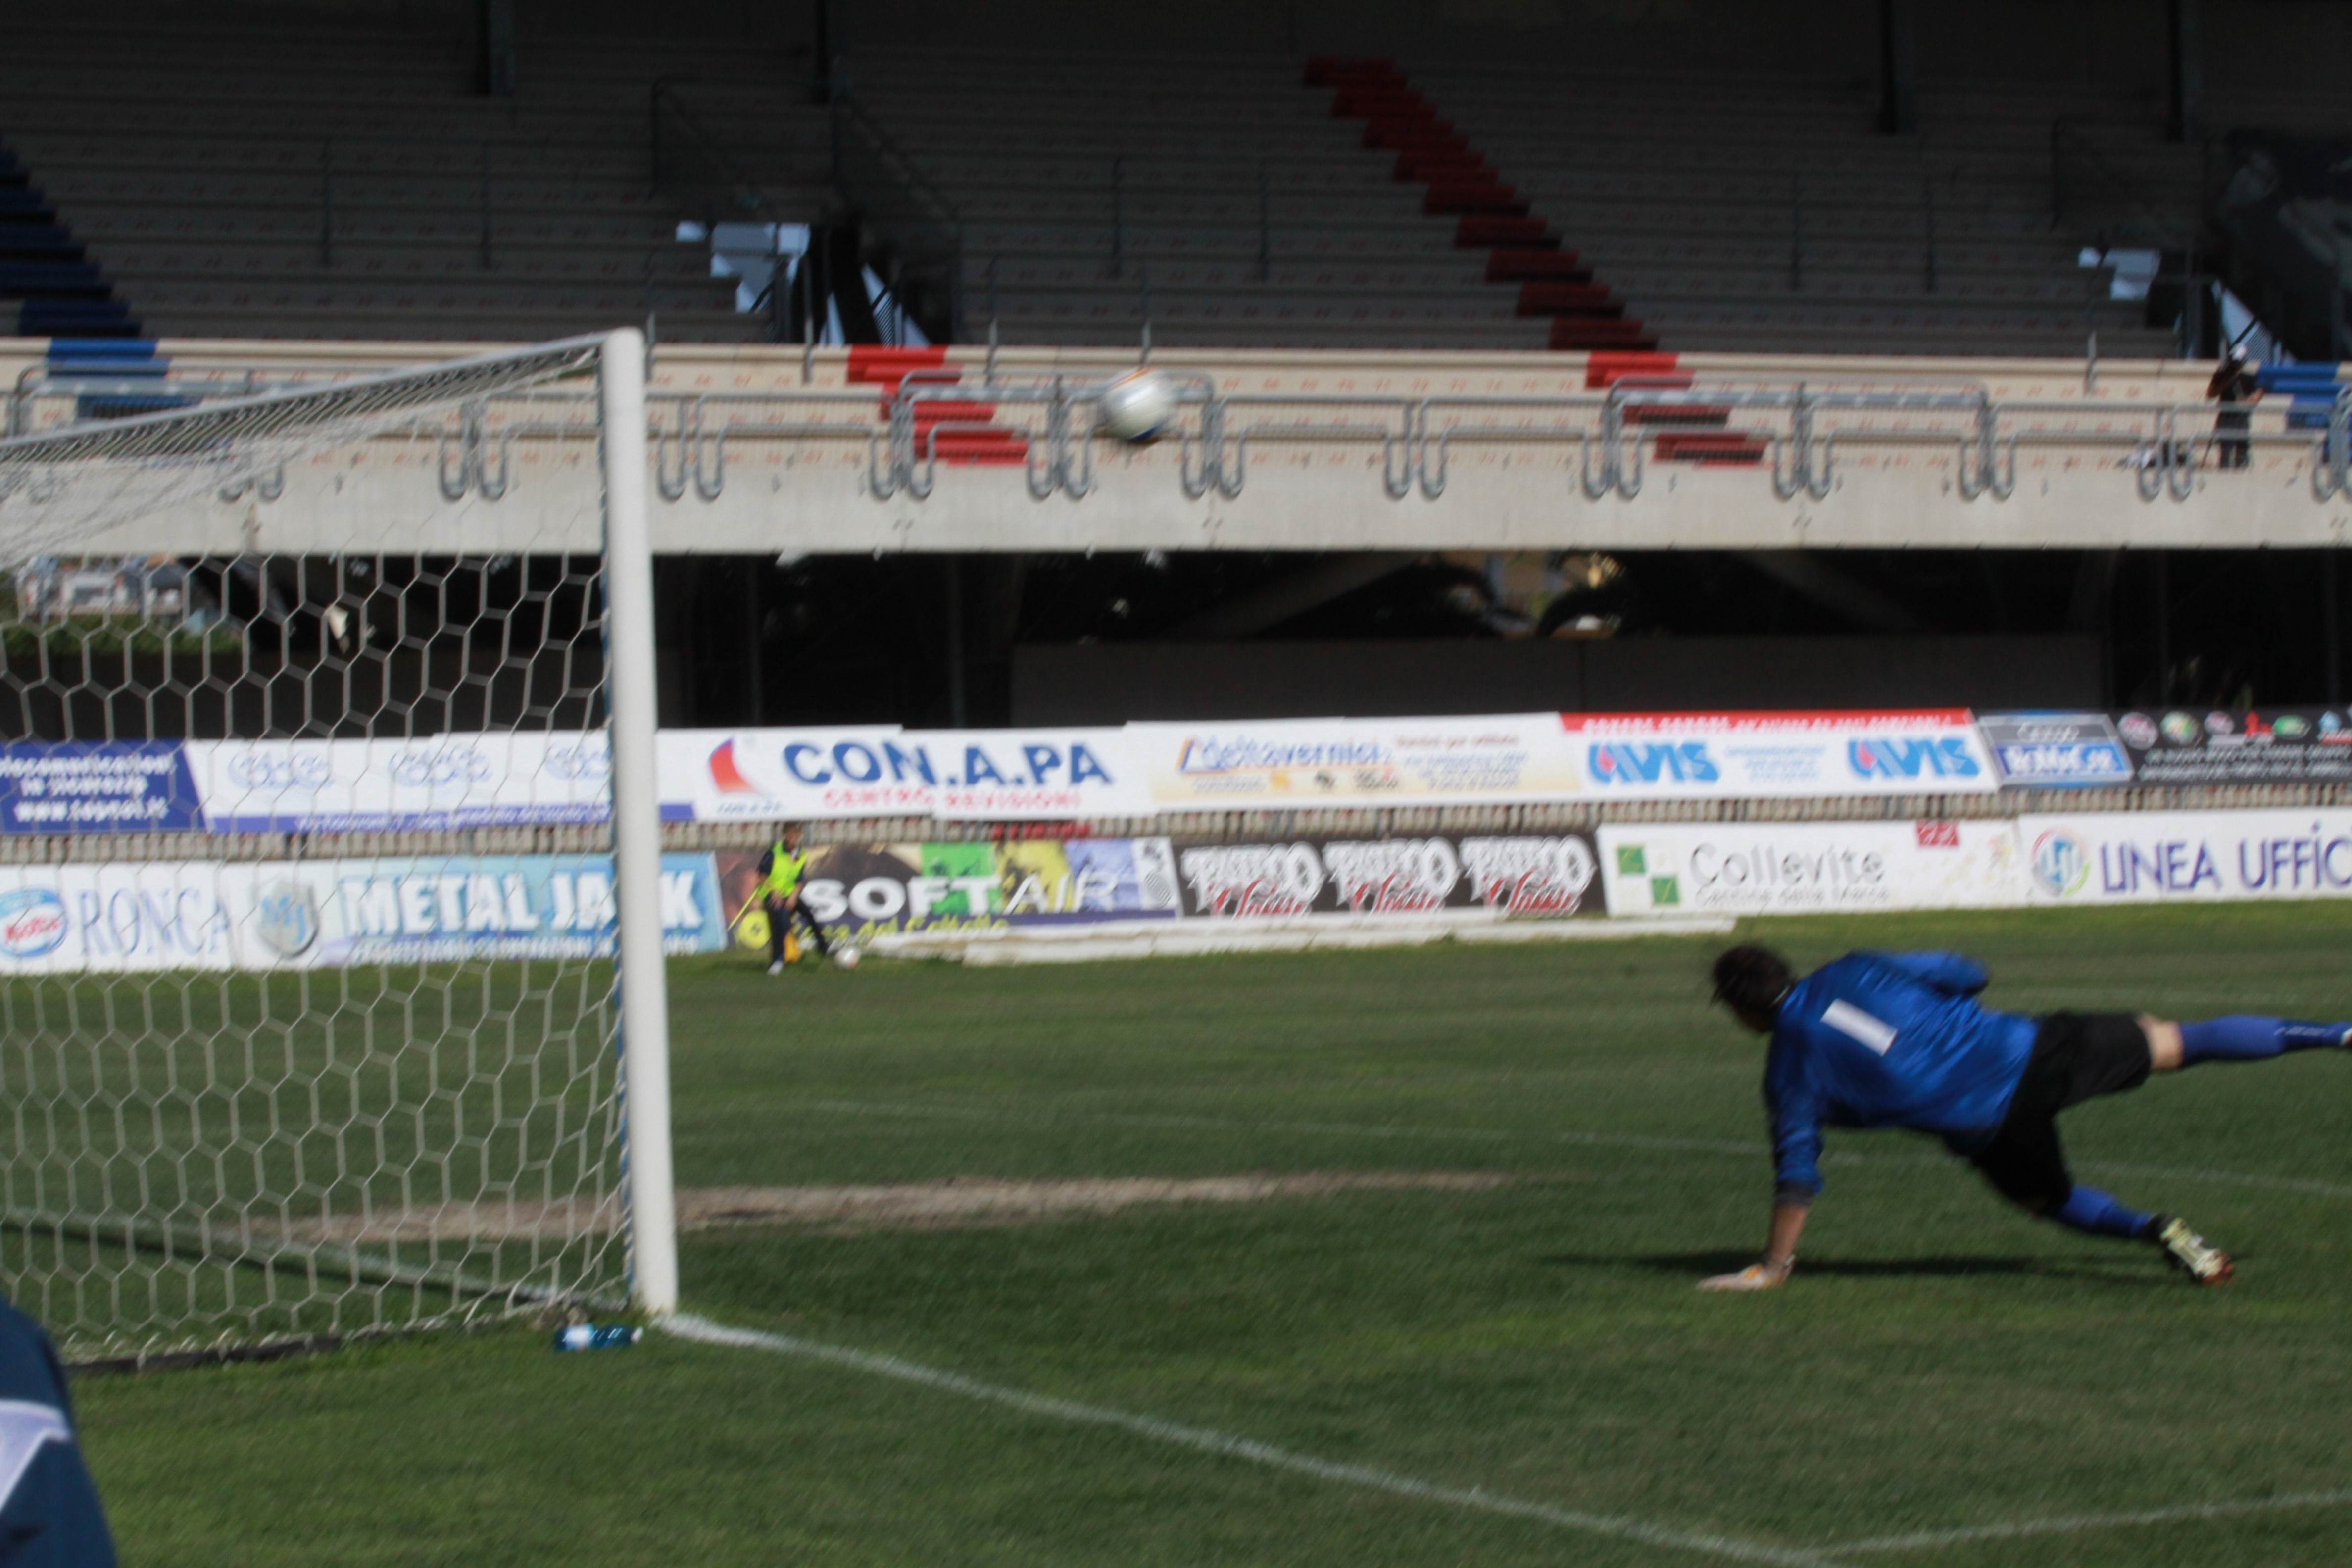 Samb-Isernia gol di Santoni 2 (bianchini)